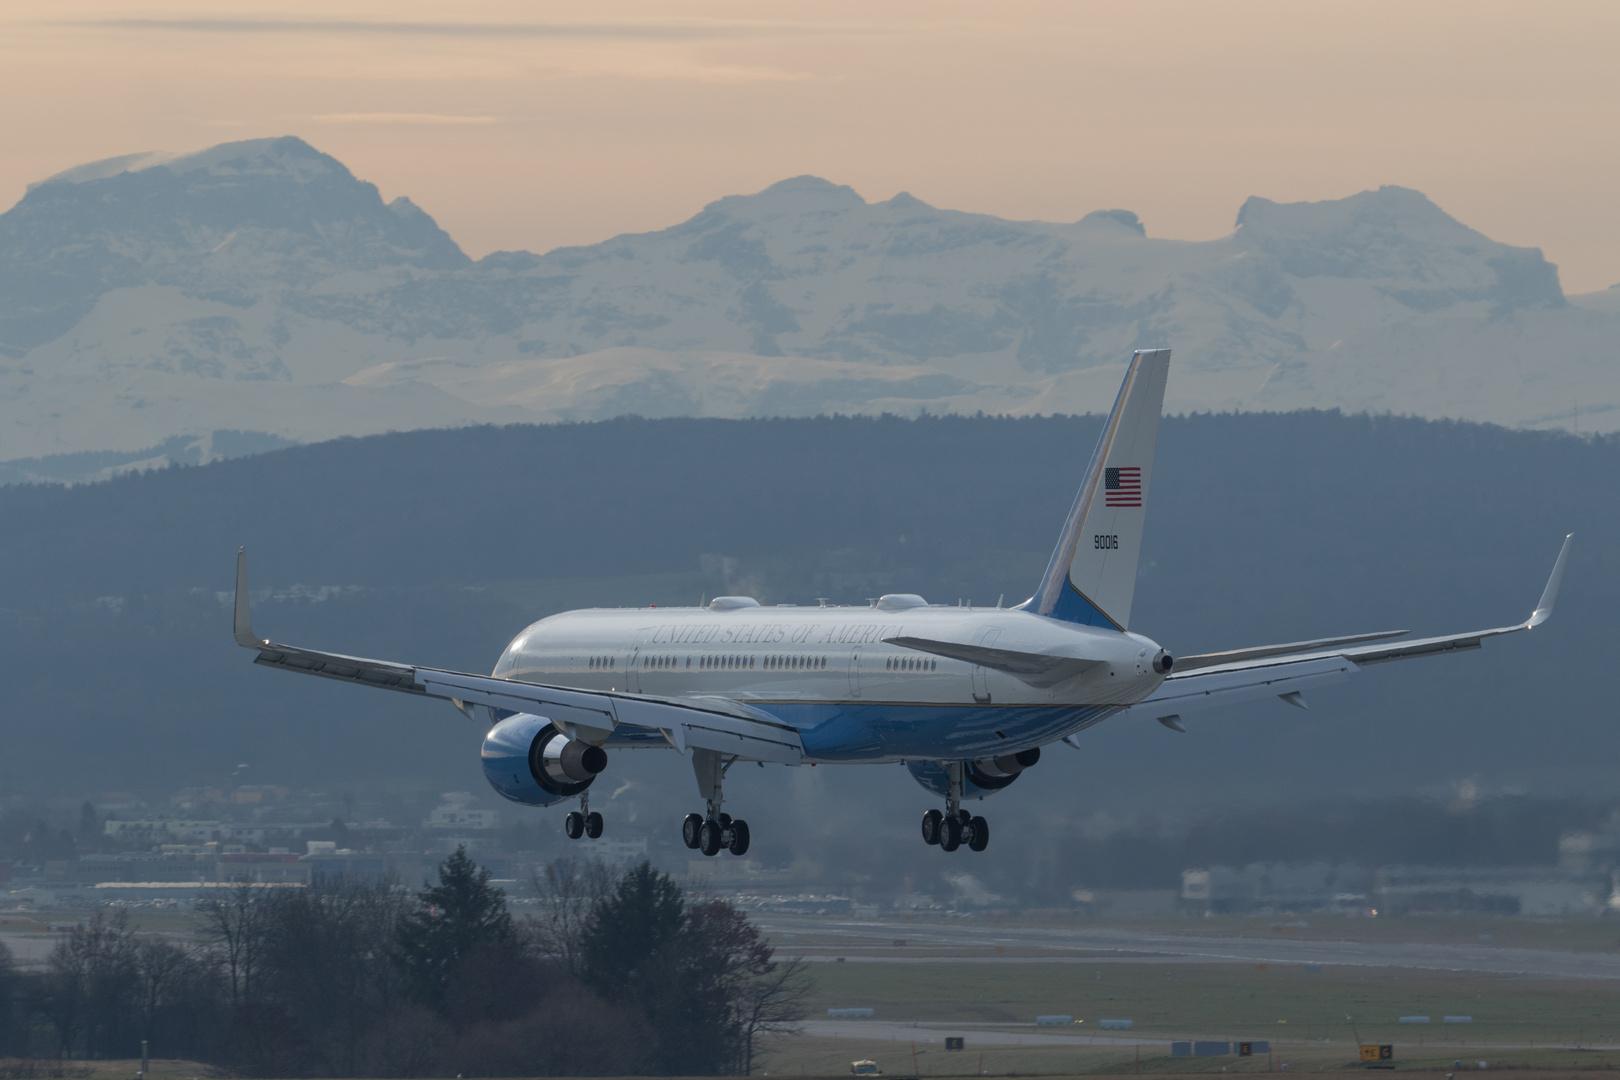 US AIR FORCE 90016